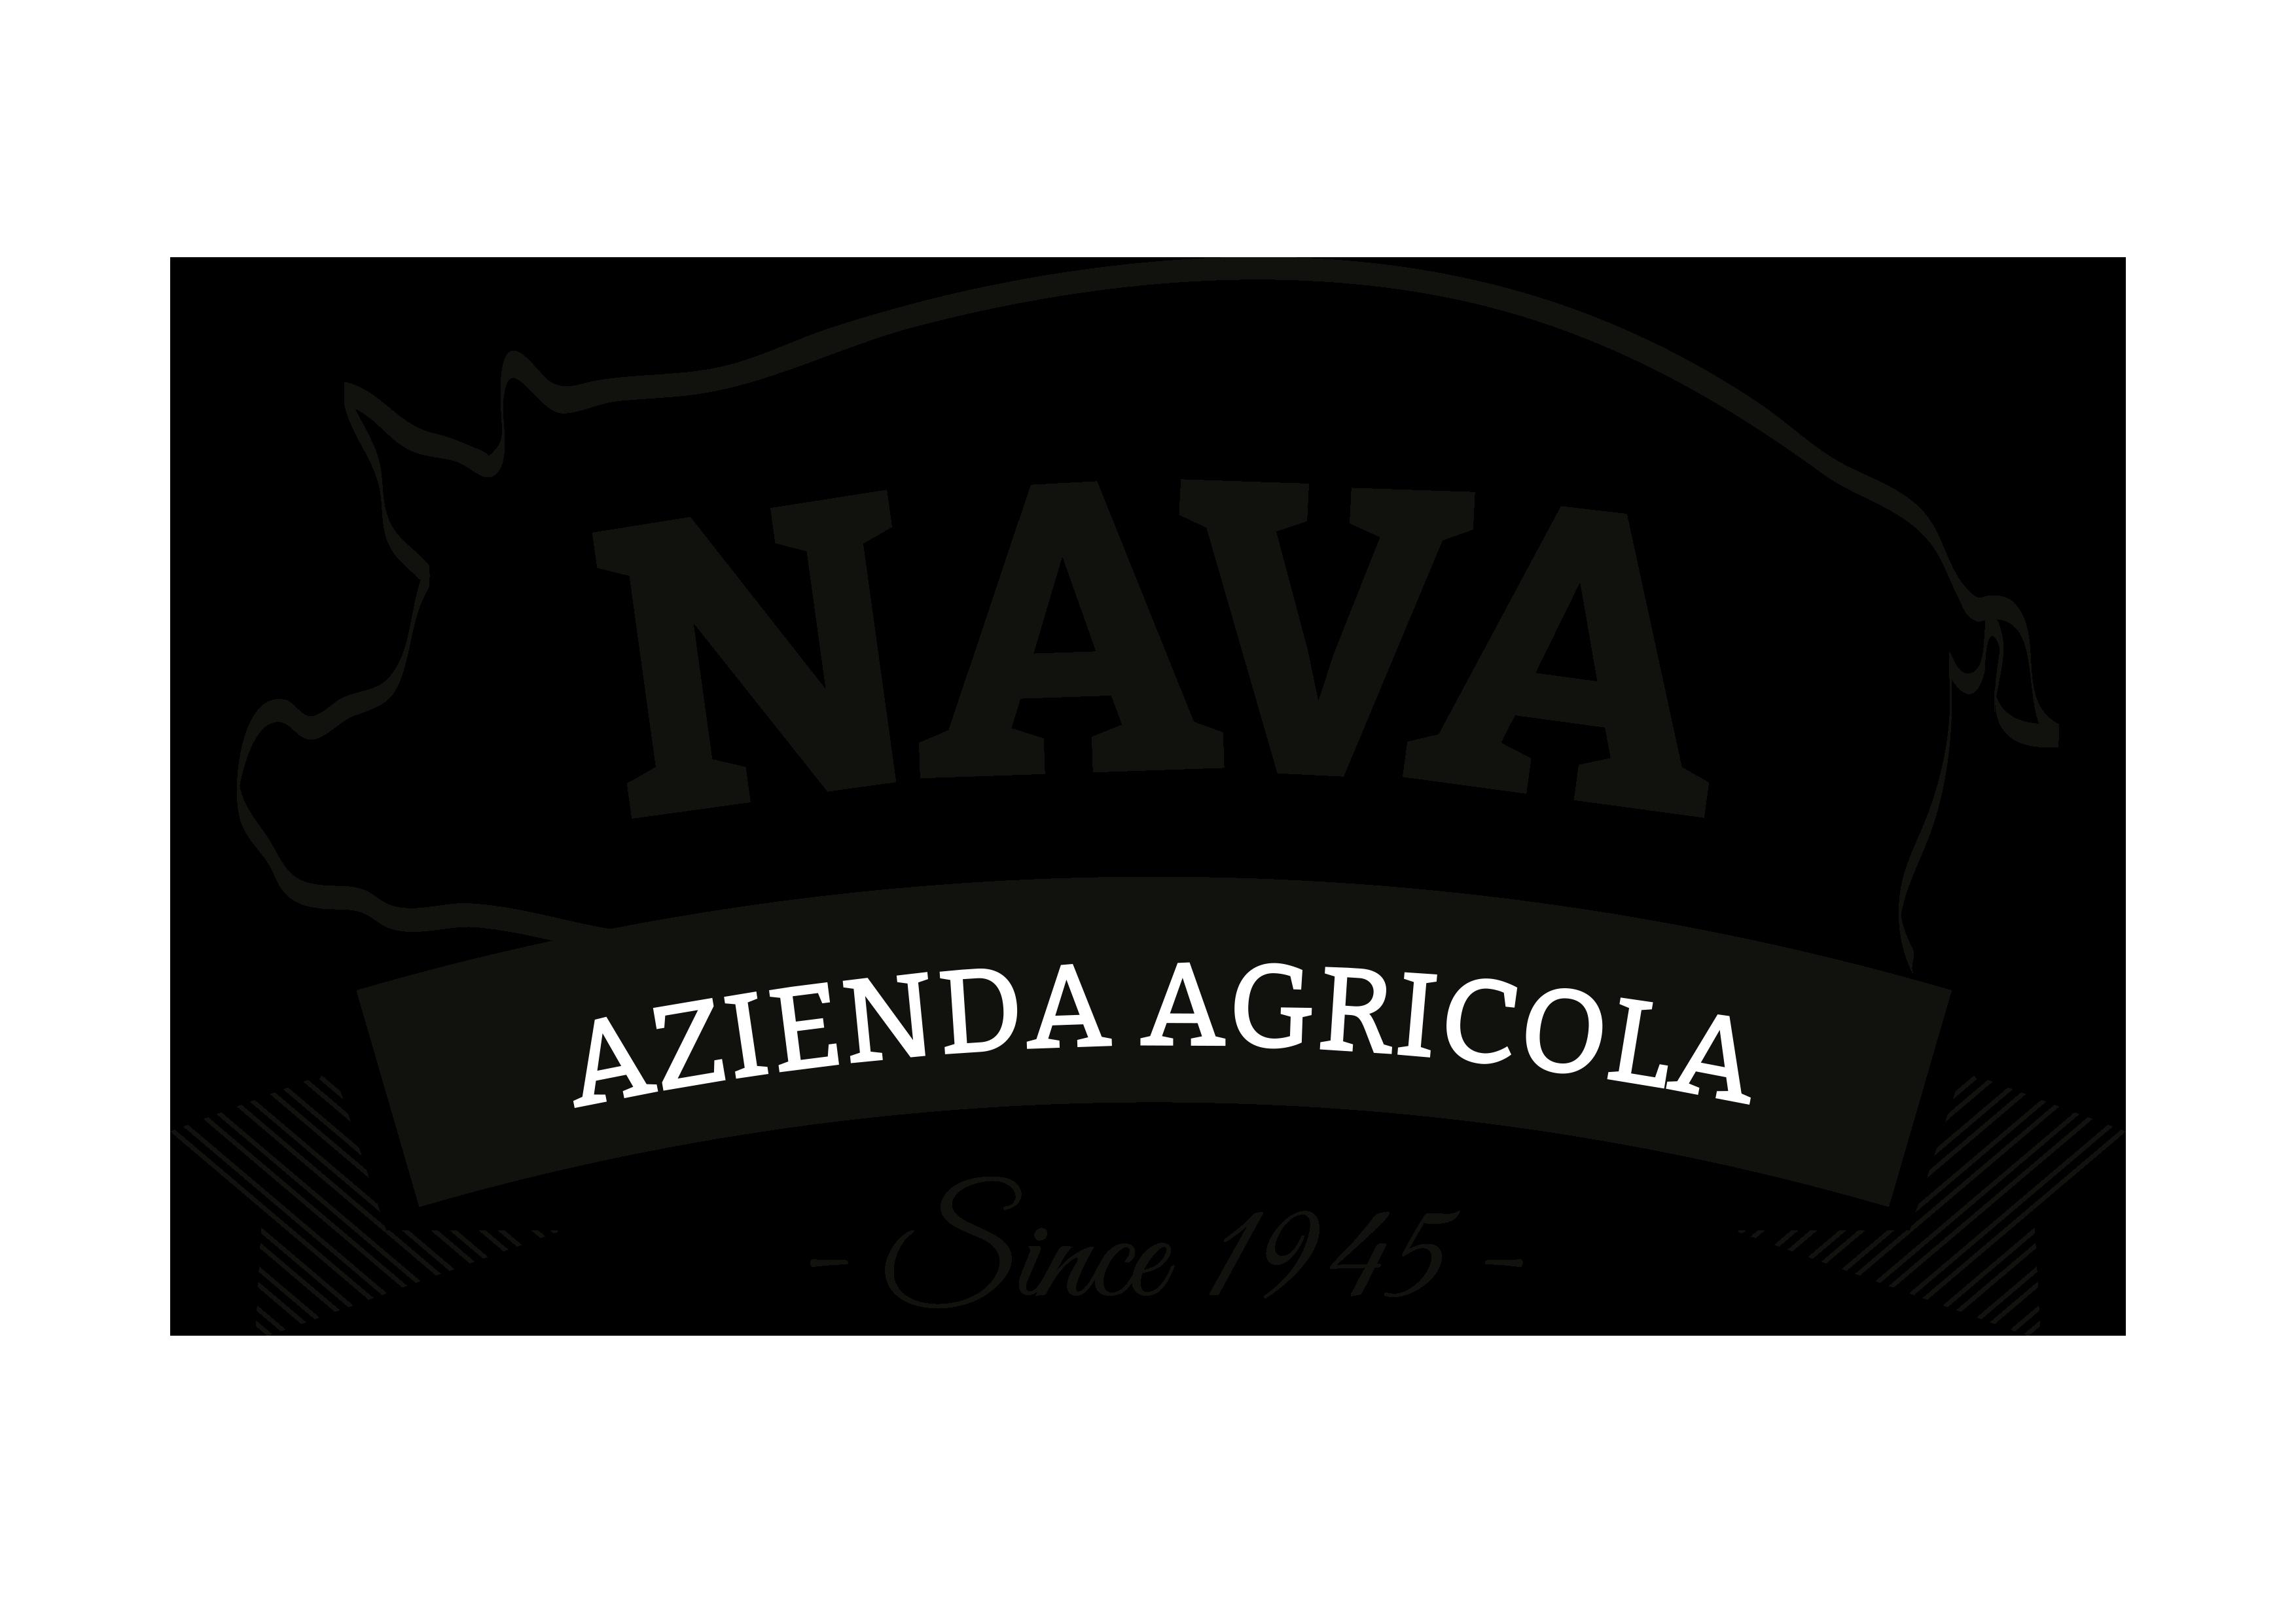 Agricola Nava